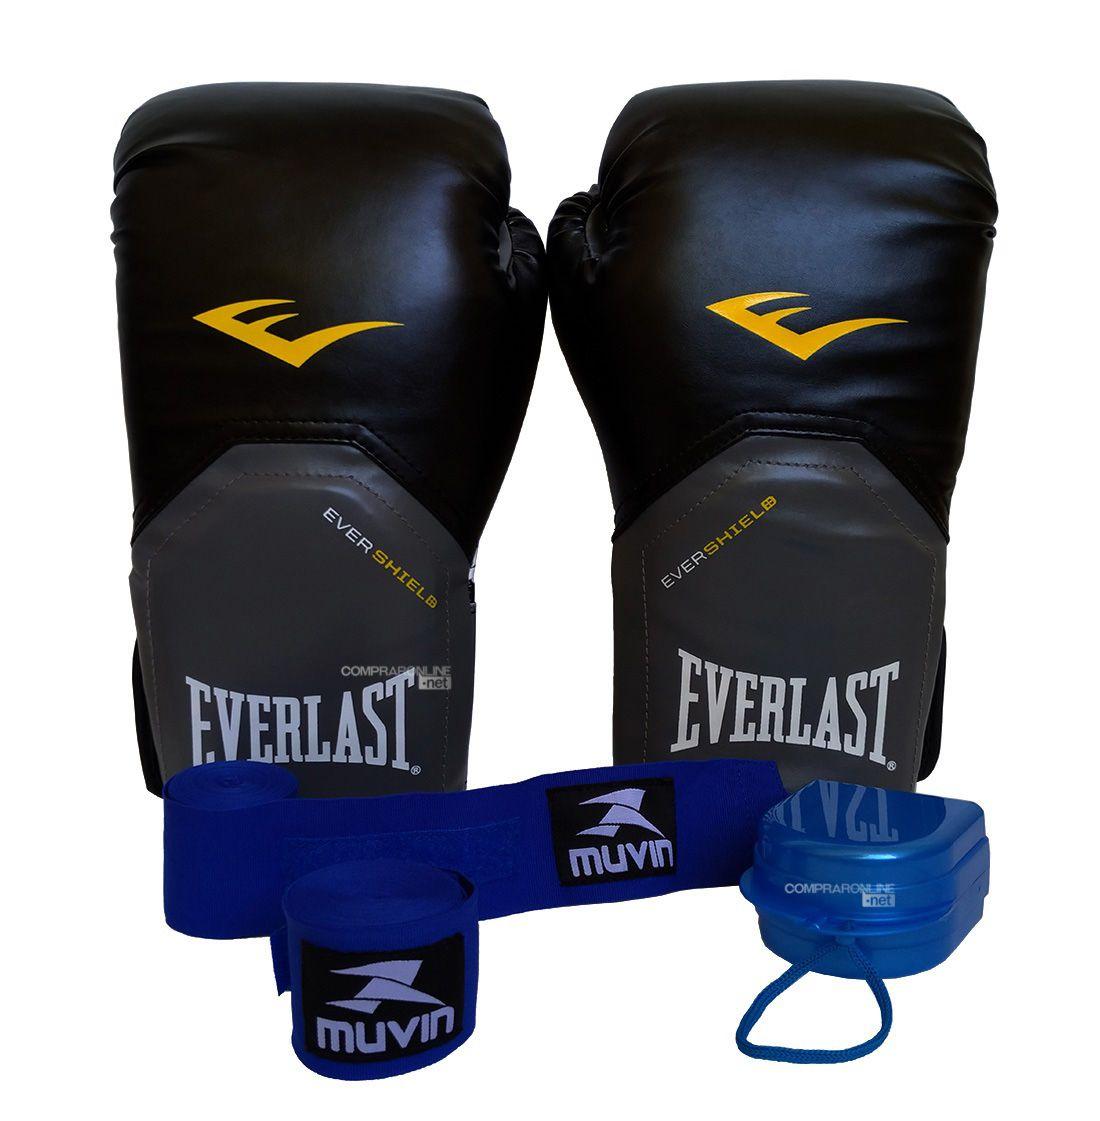 2a8c70443 Luva Bandagens Bucal Para Muay Thai Boxe Everlast 12 Oz Pro Style - Comprar  Online .Net